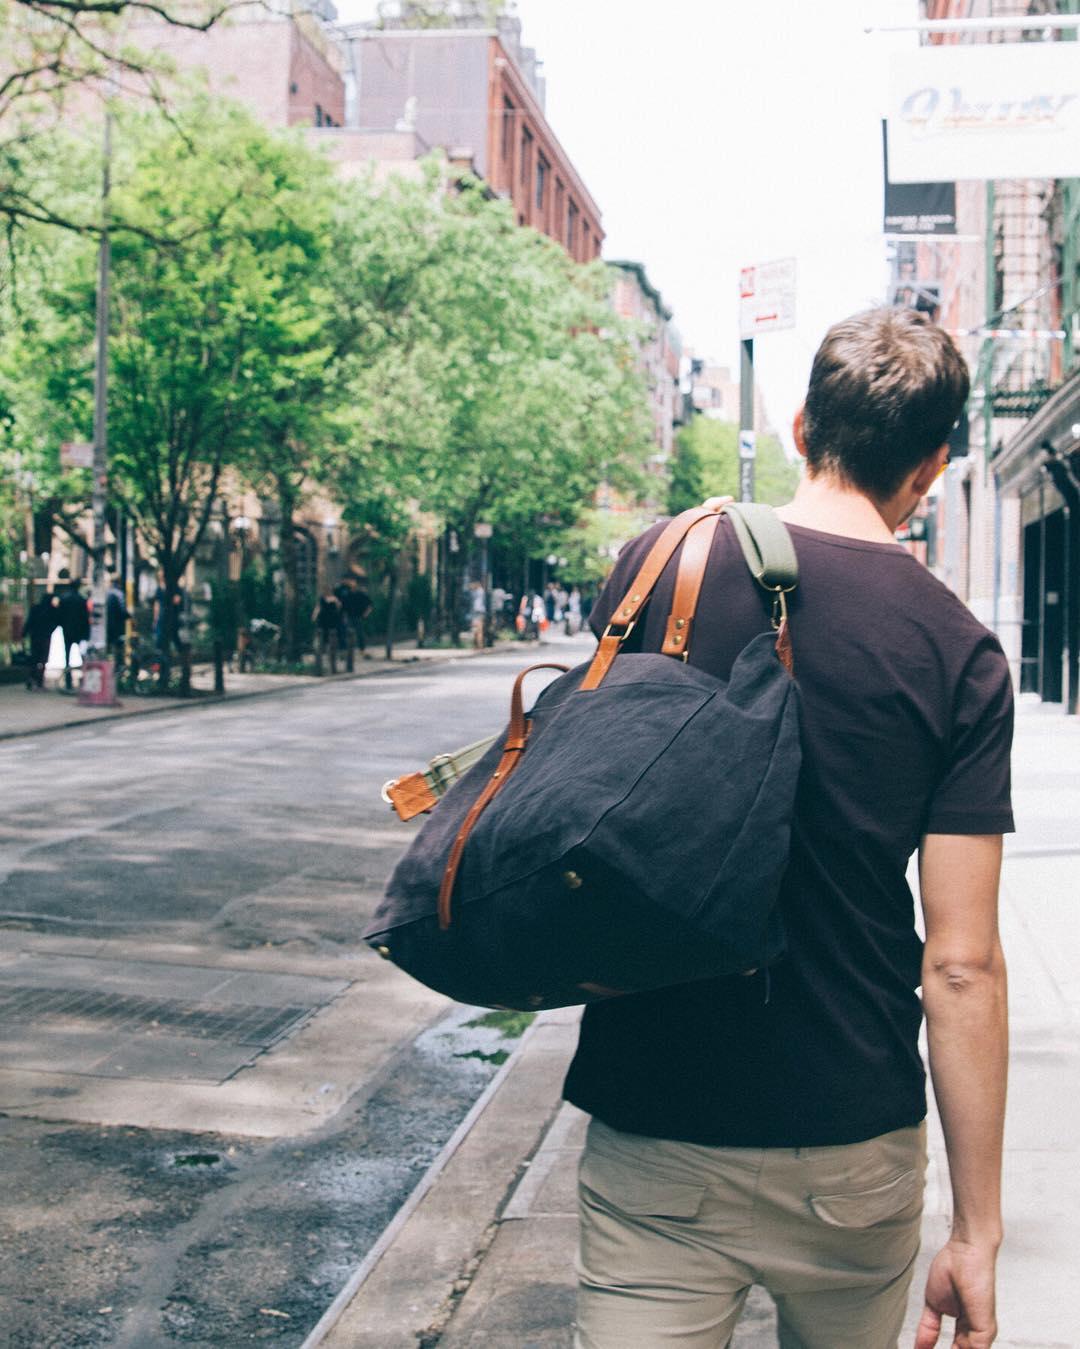 Weekender para toda la semana. Irvington en stock!  www.tinchoandlola.com ---- #tinchoandlola #tincholife #recycledstories #mochilas #cuero #algodon #diseño #diseñoargentino #buenosaires #argentina  #style #fashion #backpack #leather #cotton #canvas...